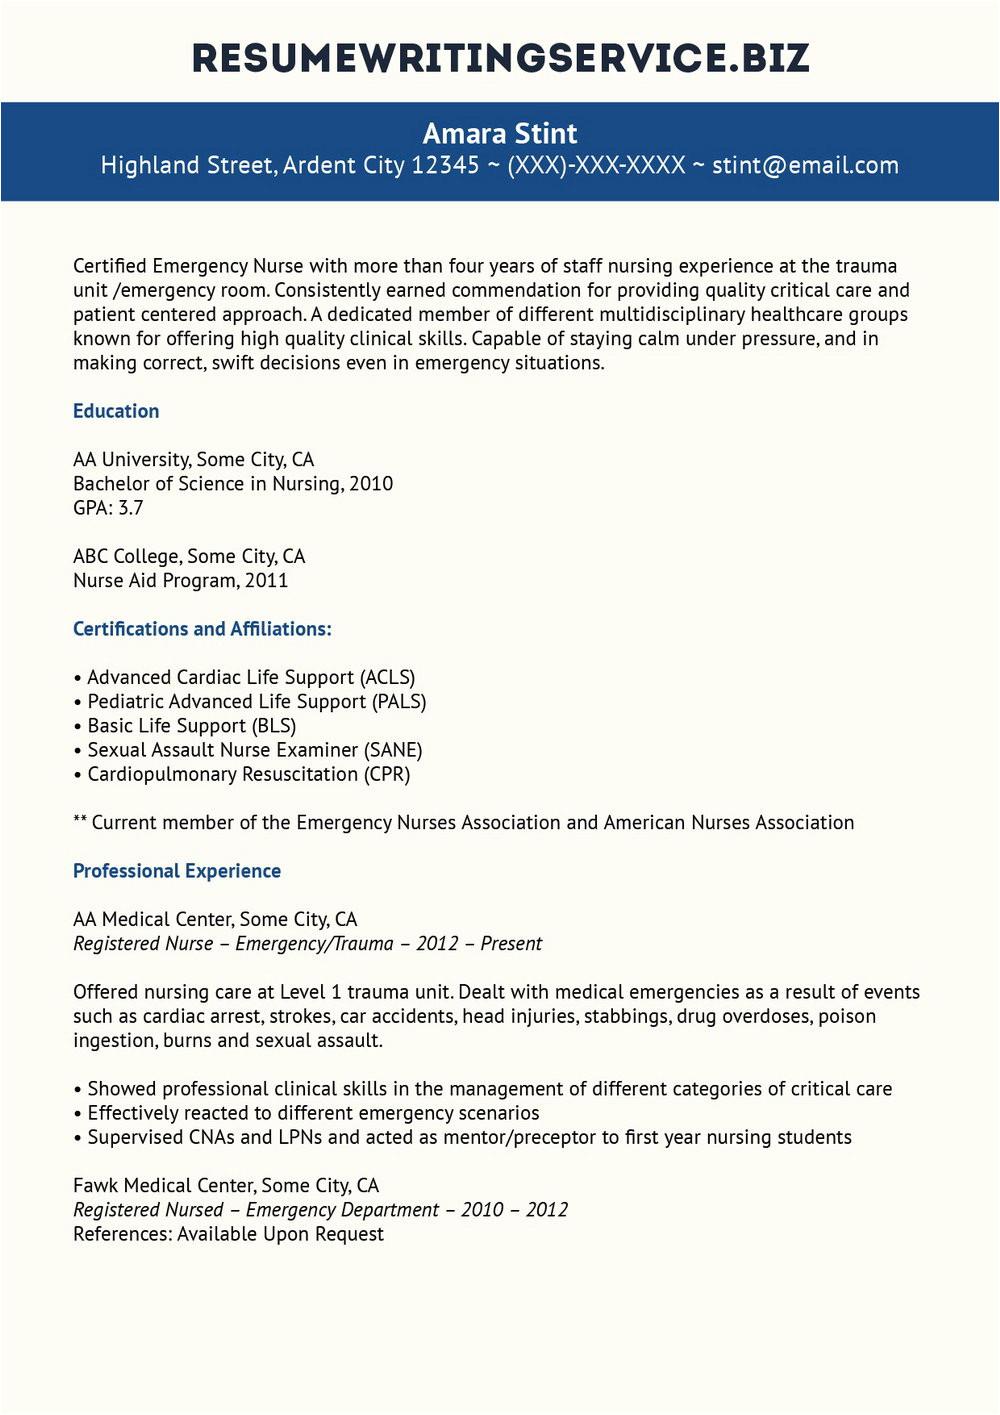 resume template for staff nurses